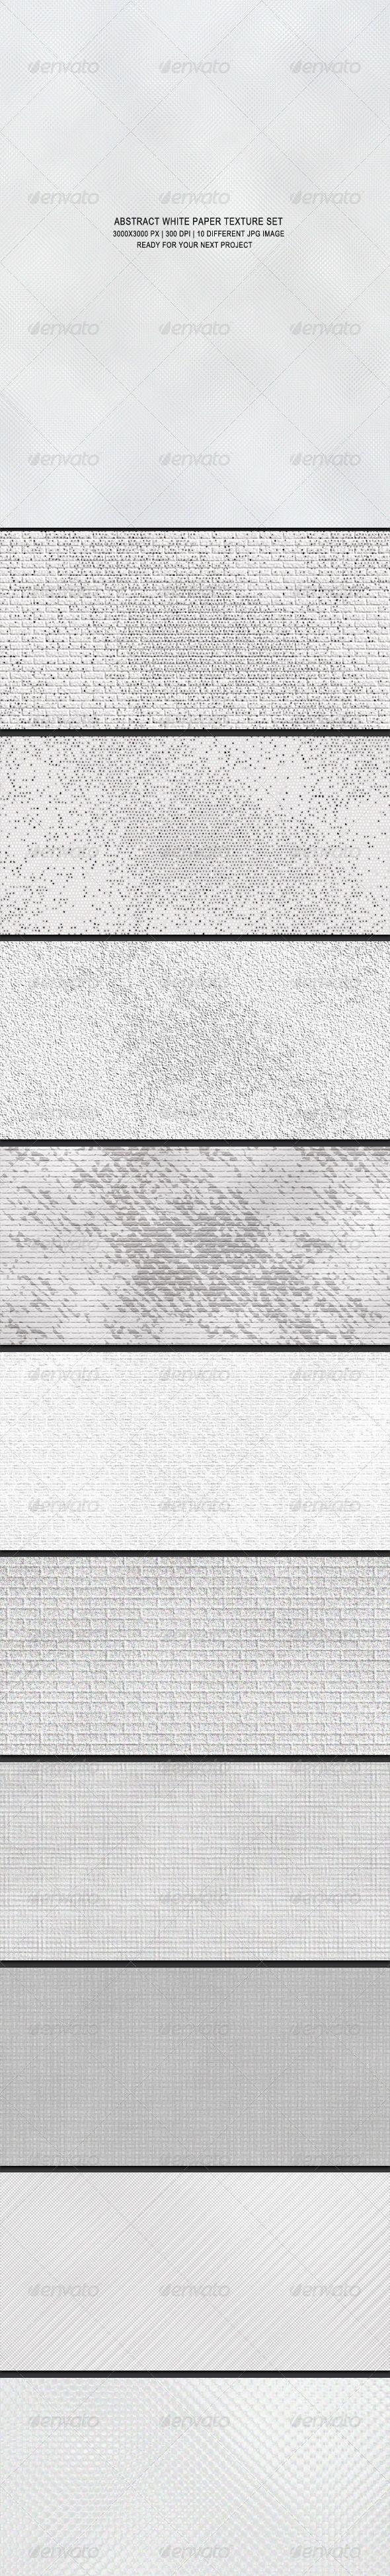 Abstract White Paper Texture Set  White Paper Presentation